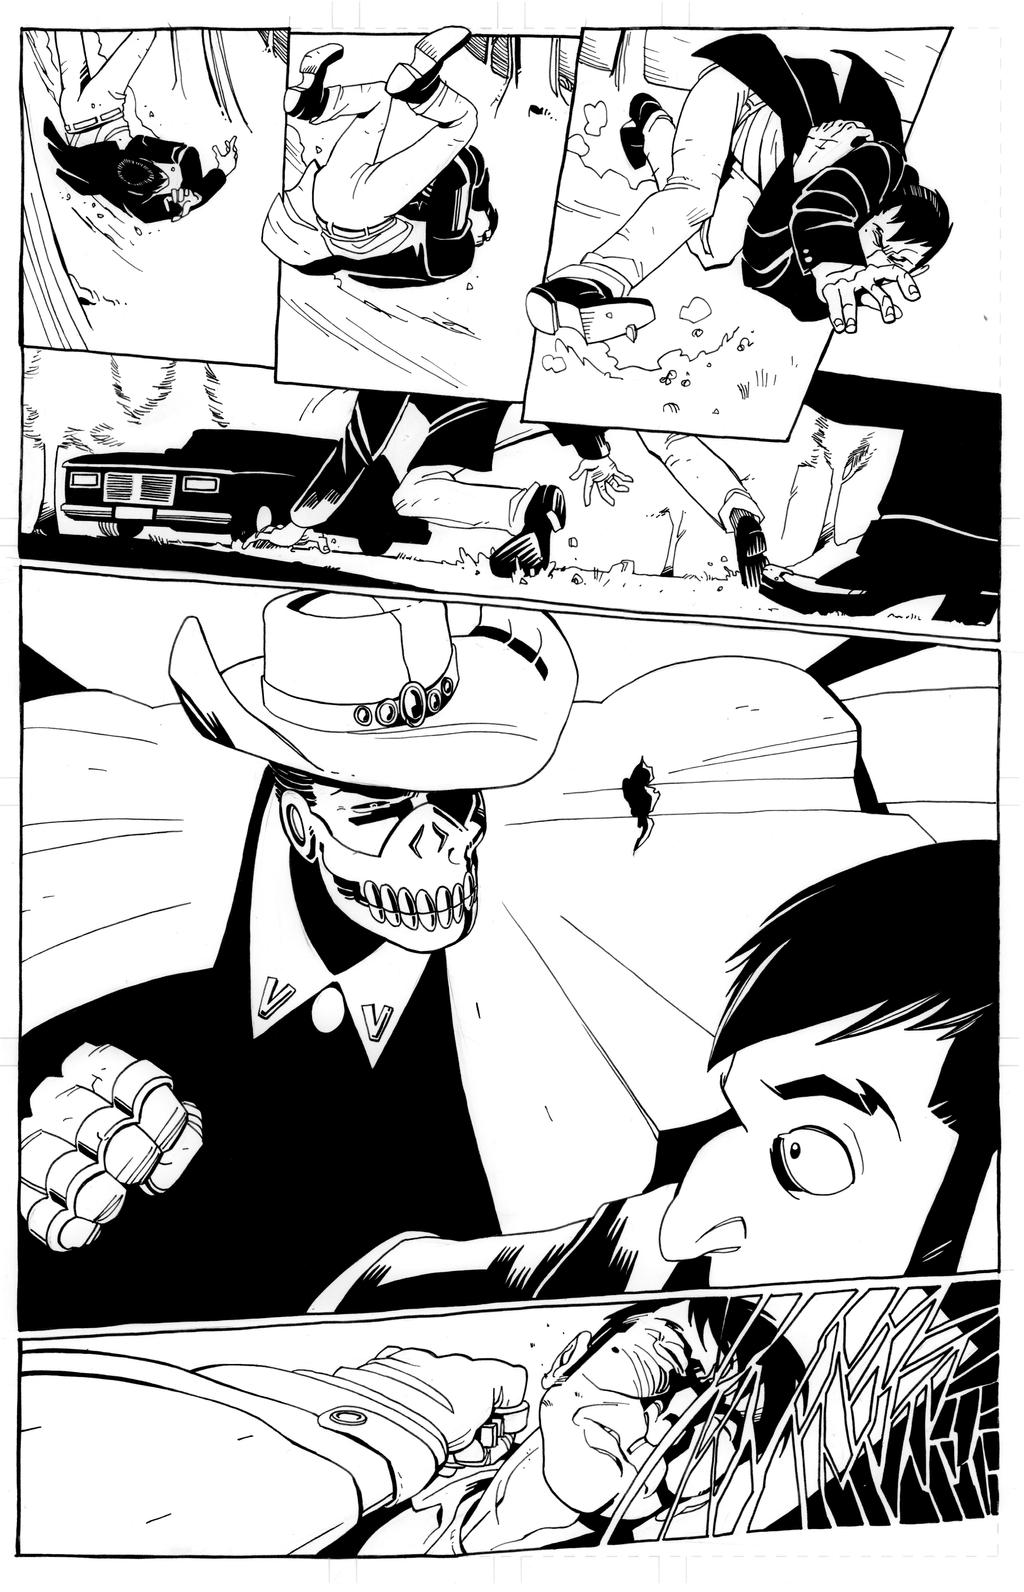 San Hannibal #3 pg 14 -- B+W by dan-sch